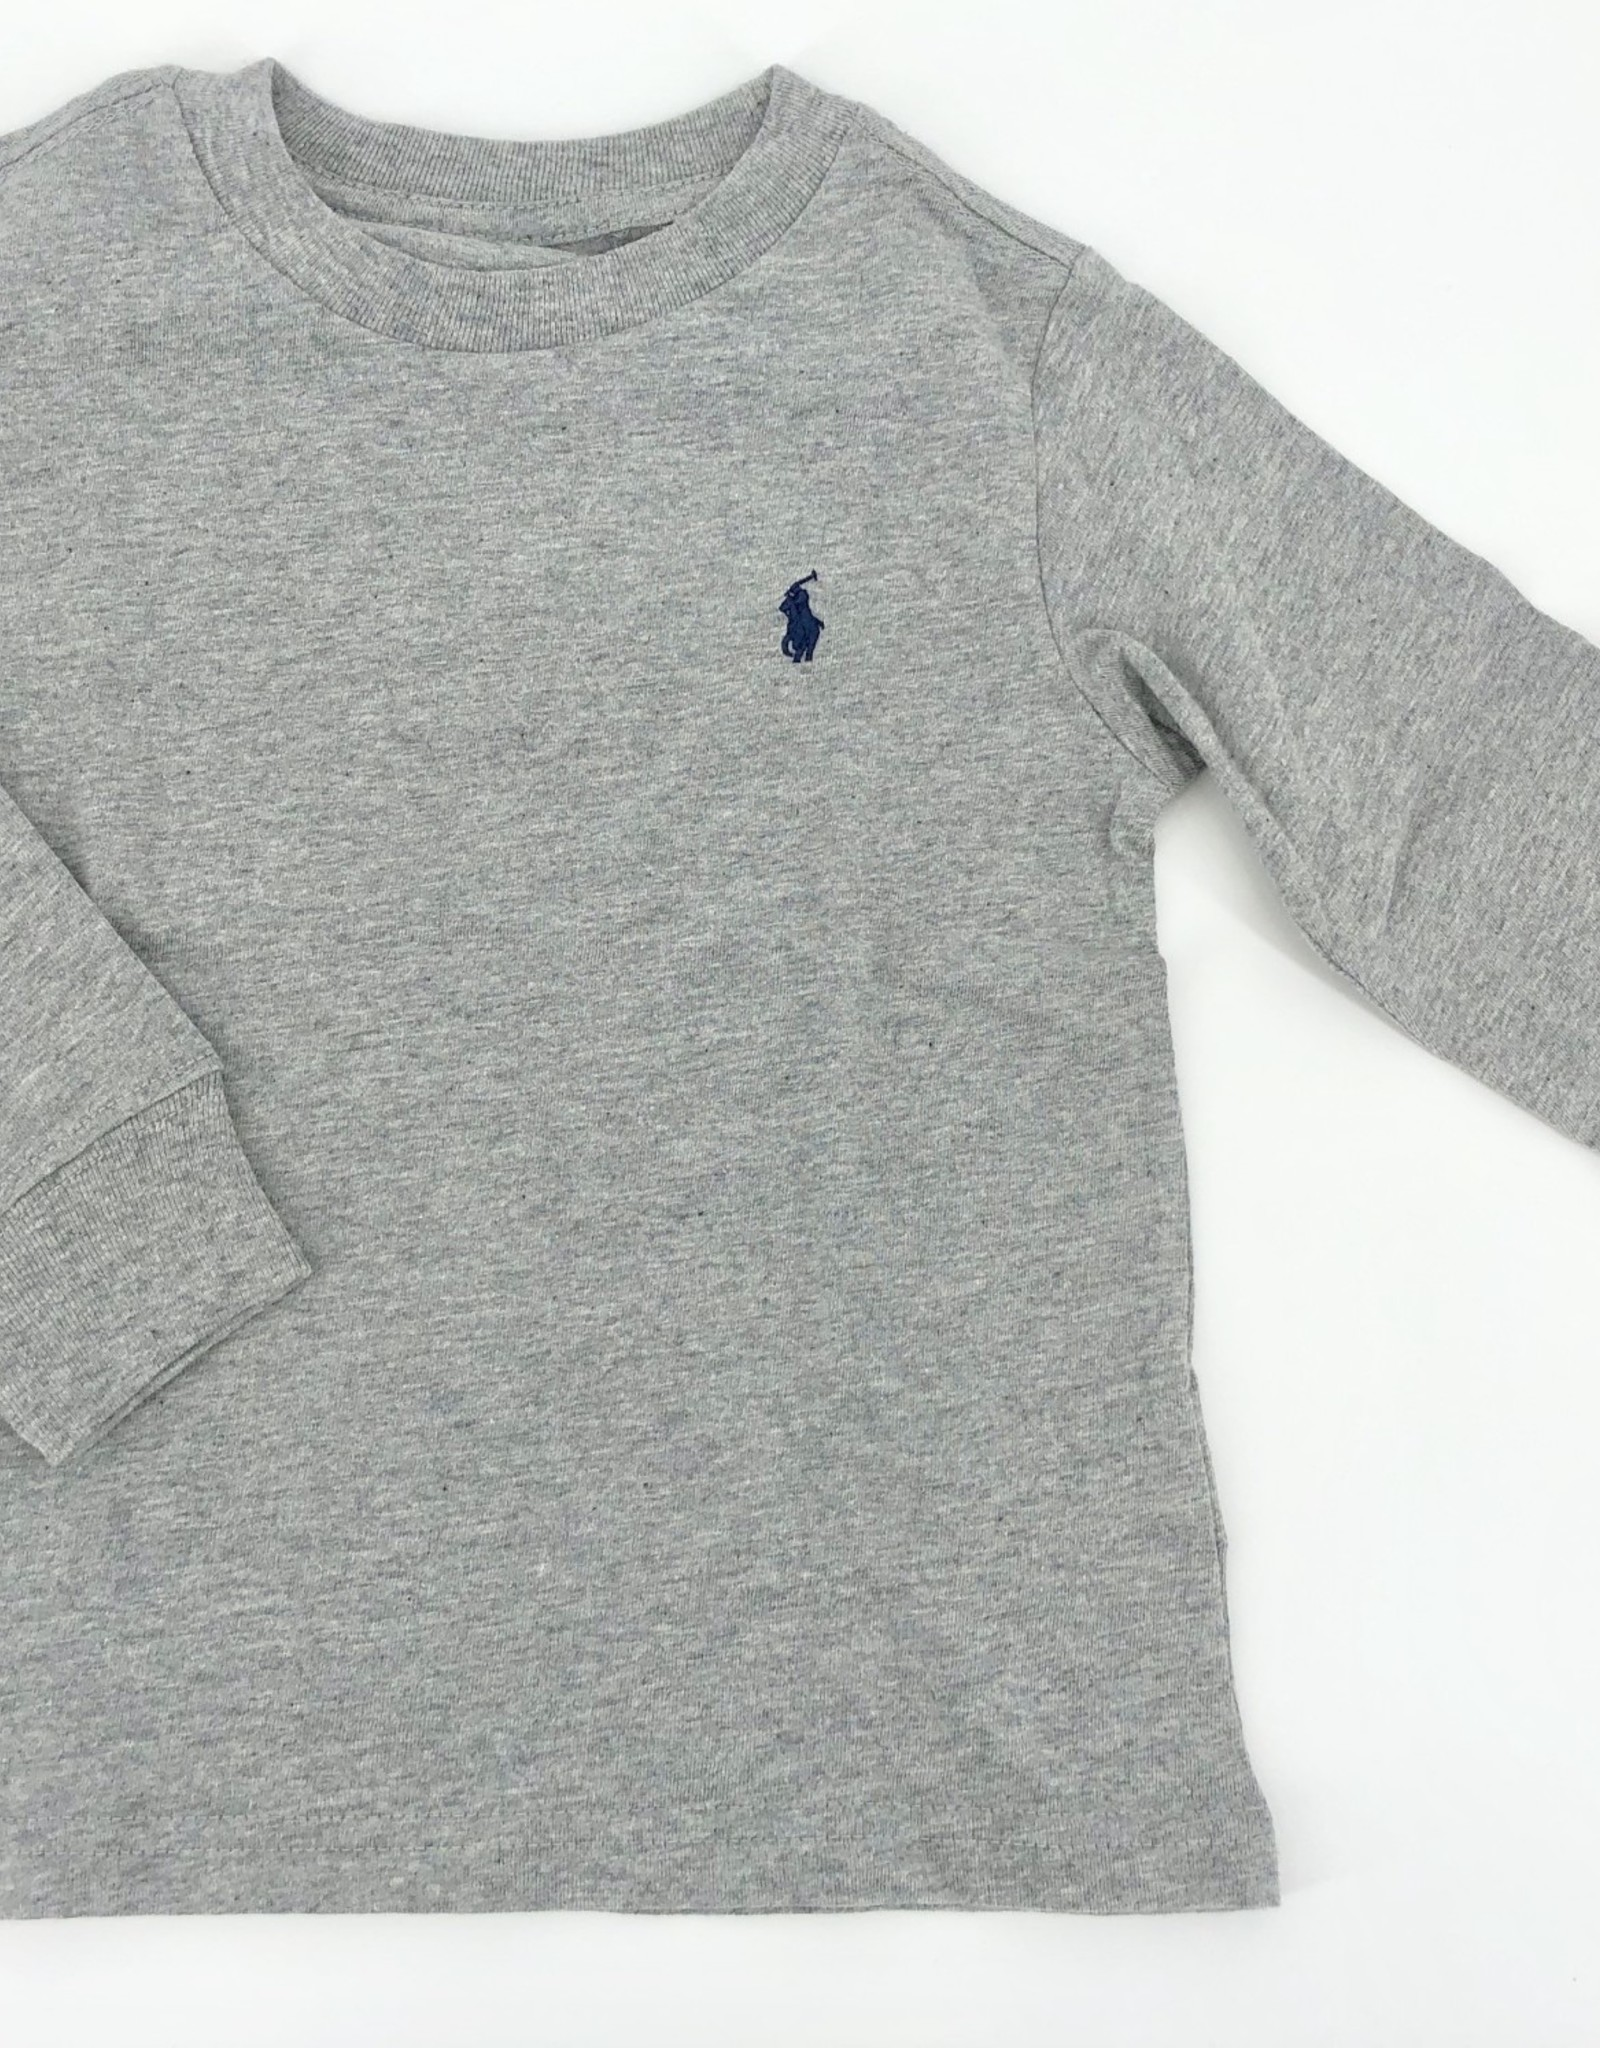 RALPH LAUREN RALPH LAUREN T-shirt grijs